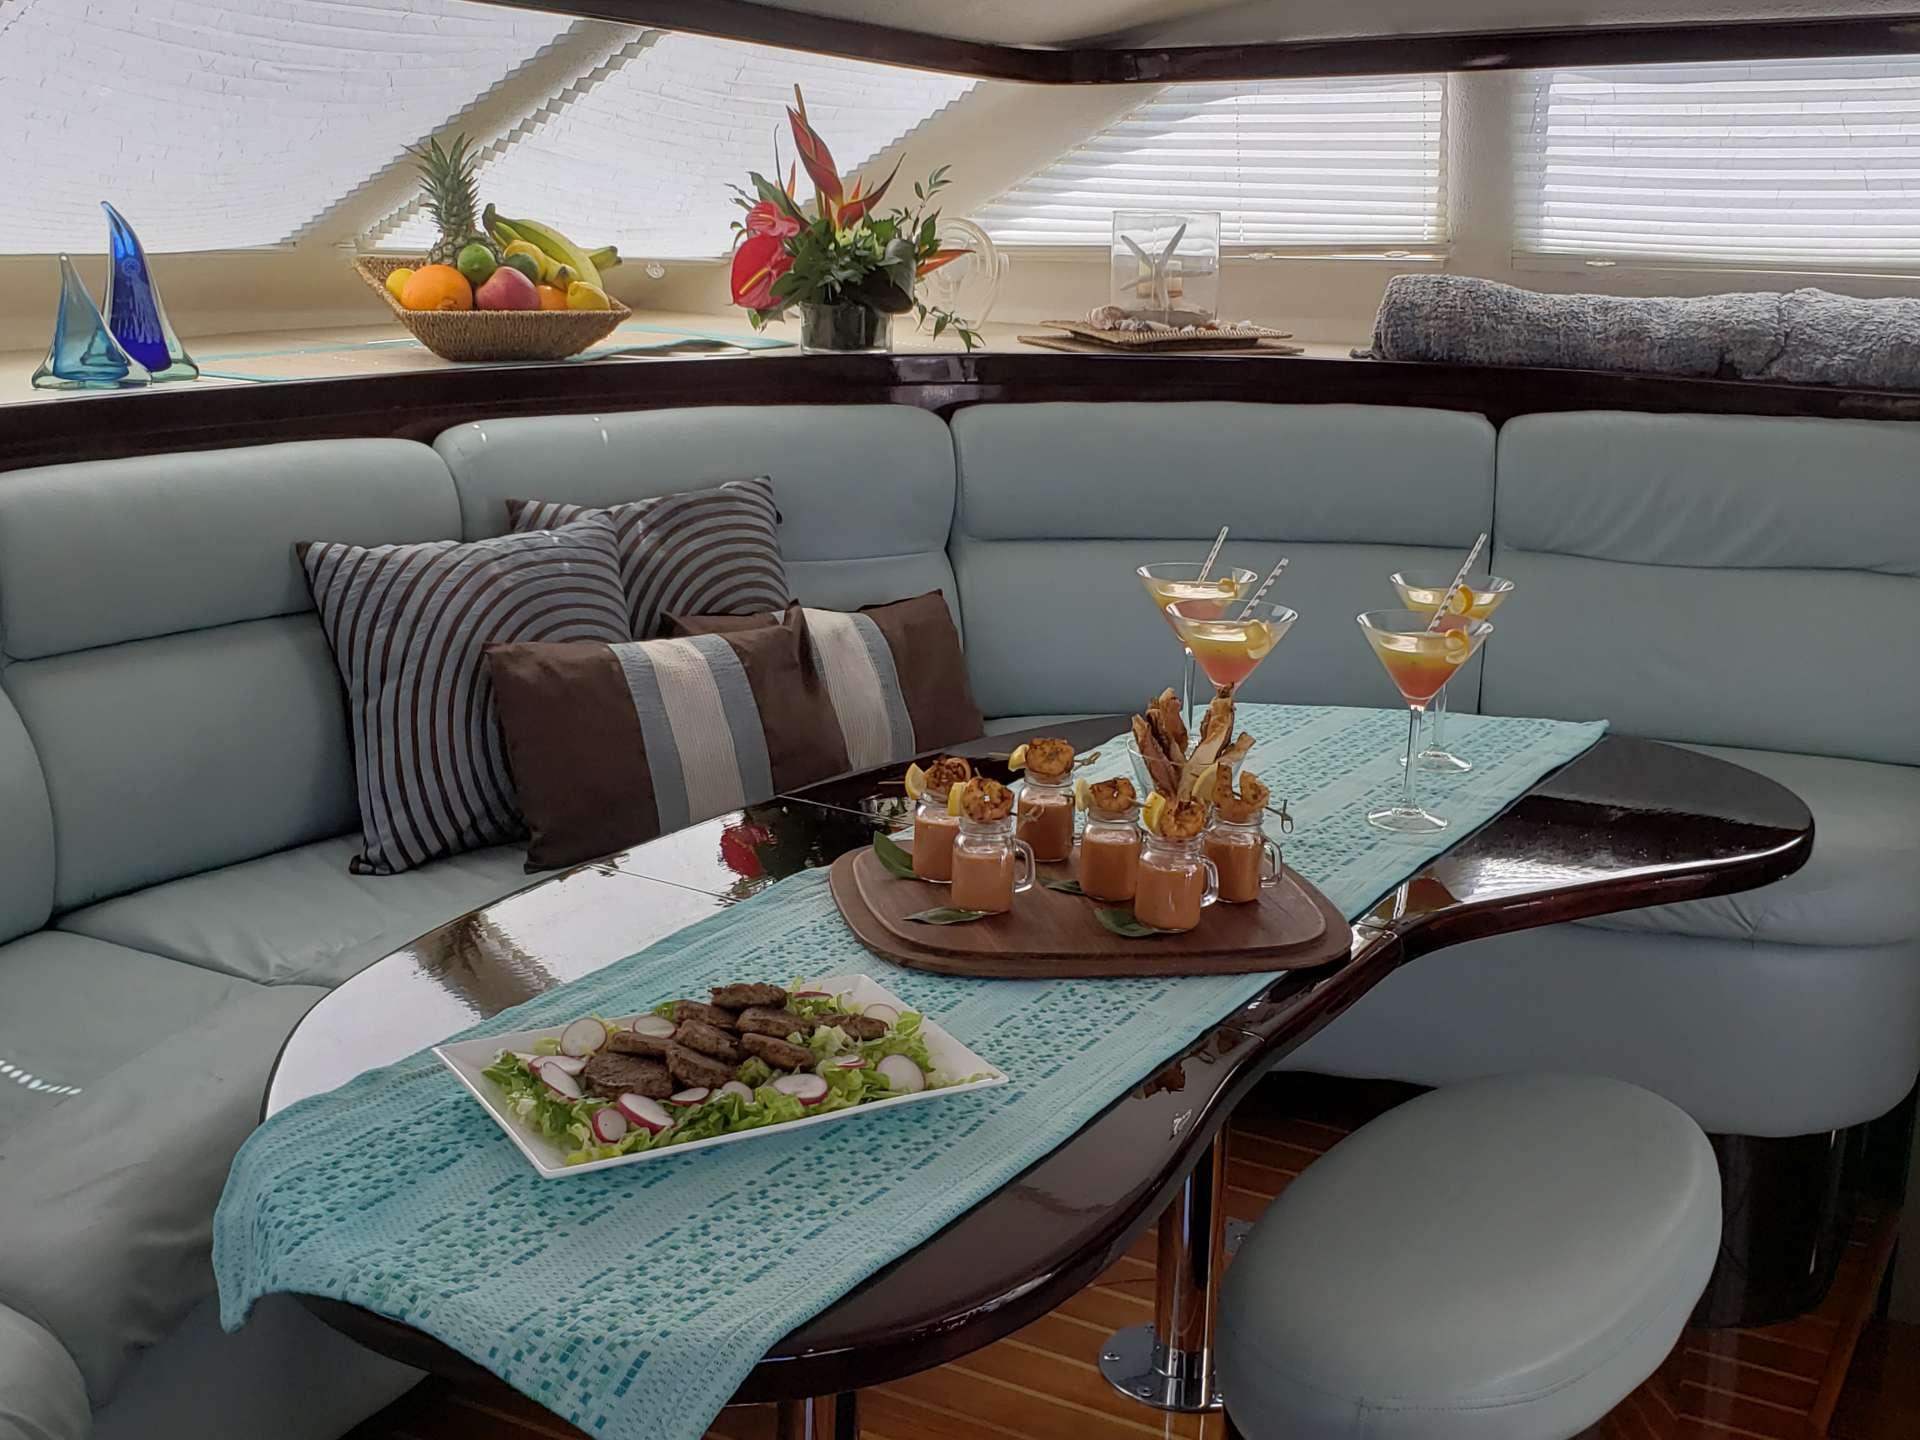 Catamaran Yacht 'NUTMEG' Main saloon area, 8 PAX, 2 Crew, 50.00 Ft, 15.00 Meters, Built 2008, St. Francis, Refit Year 2019